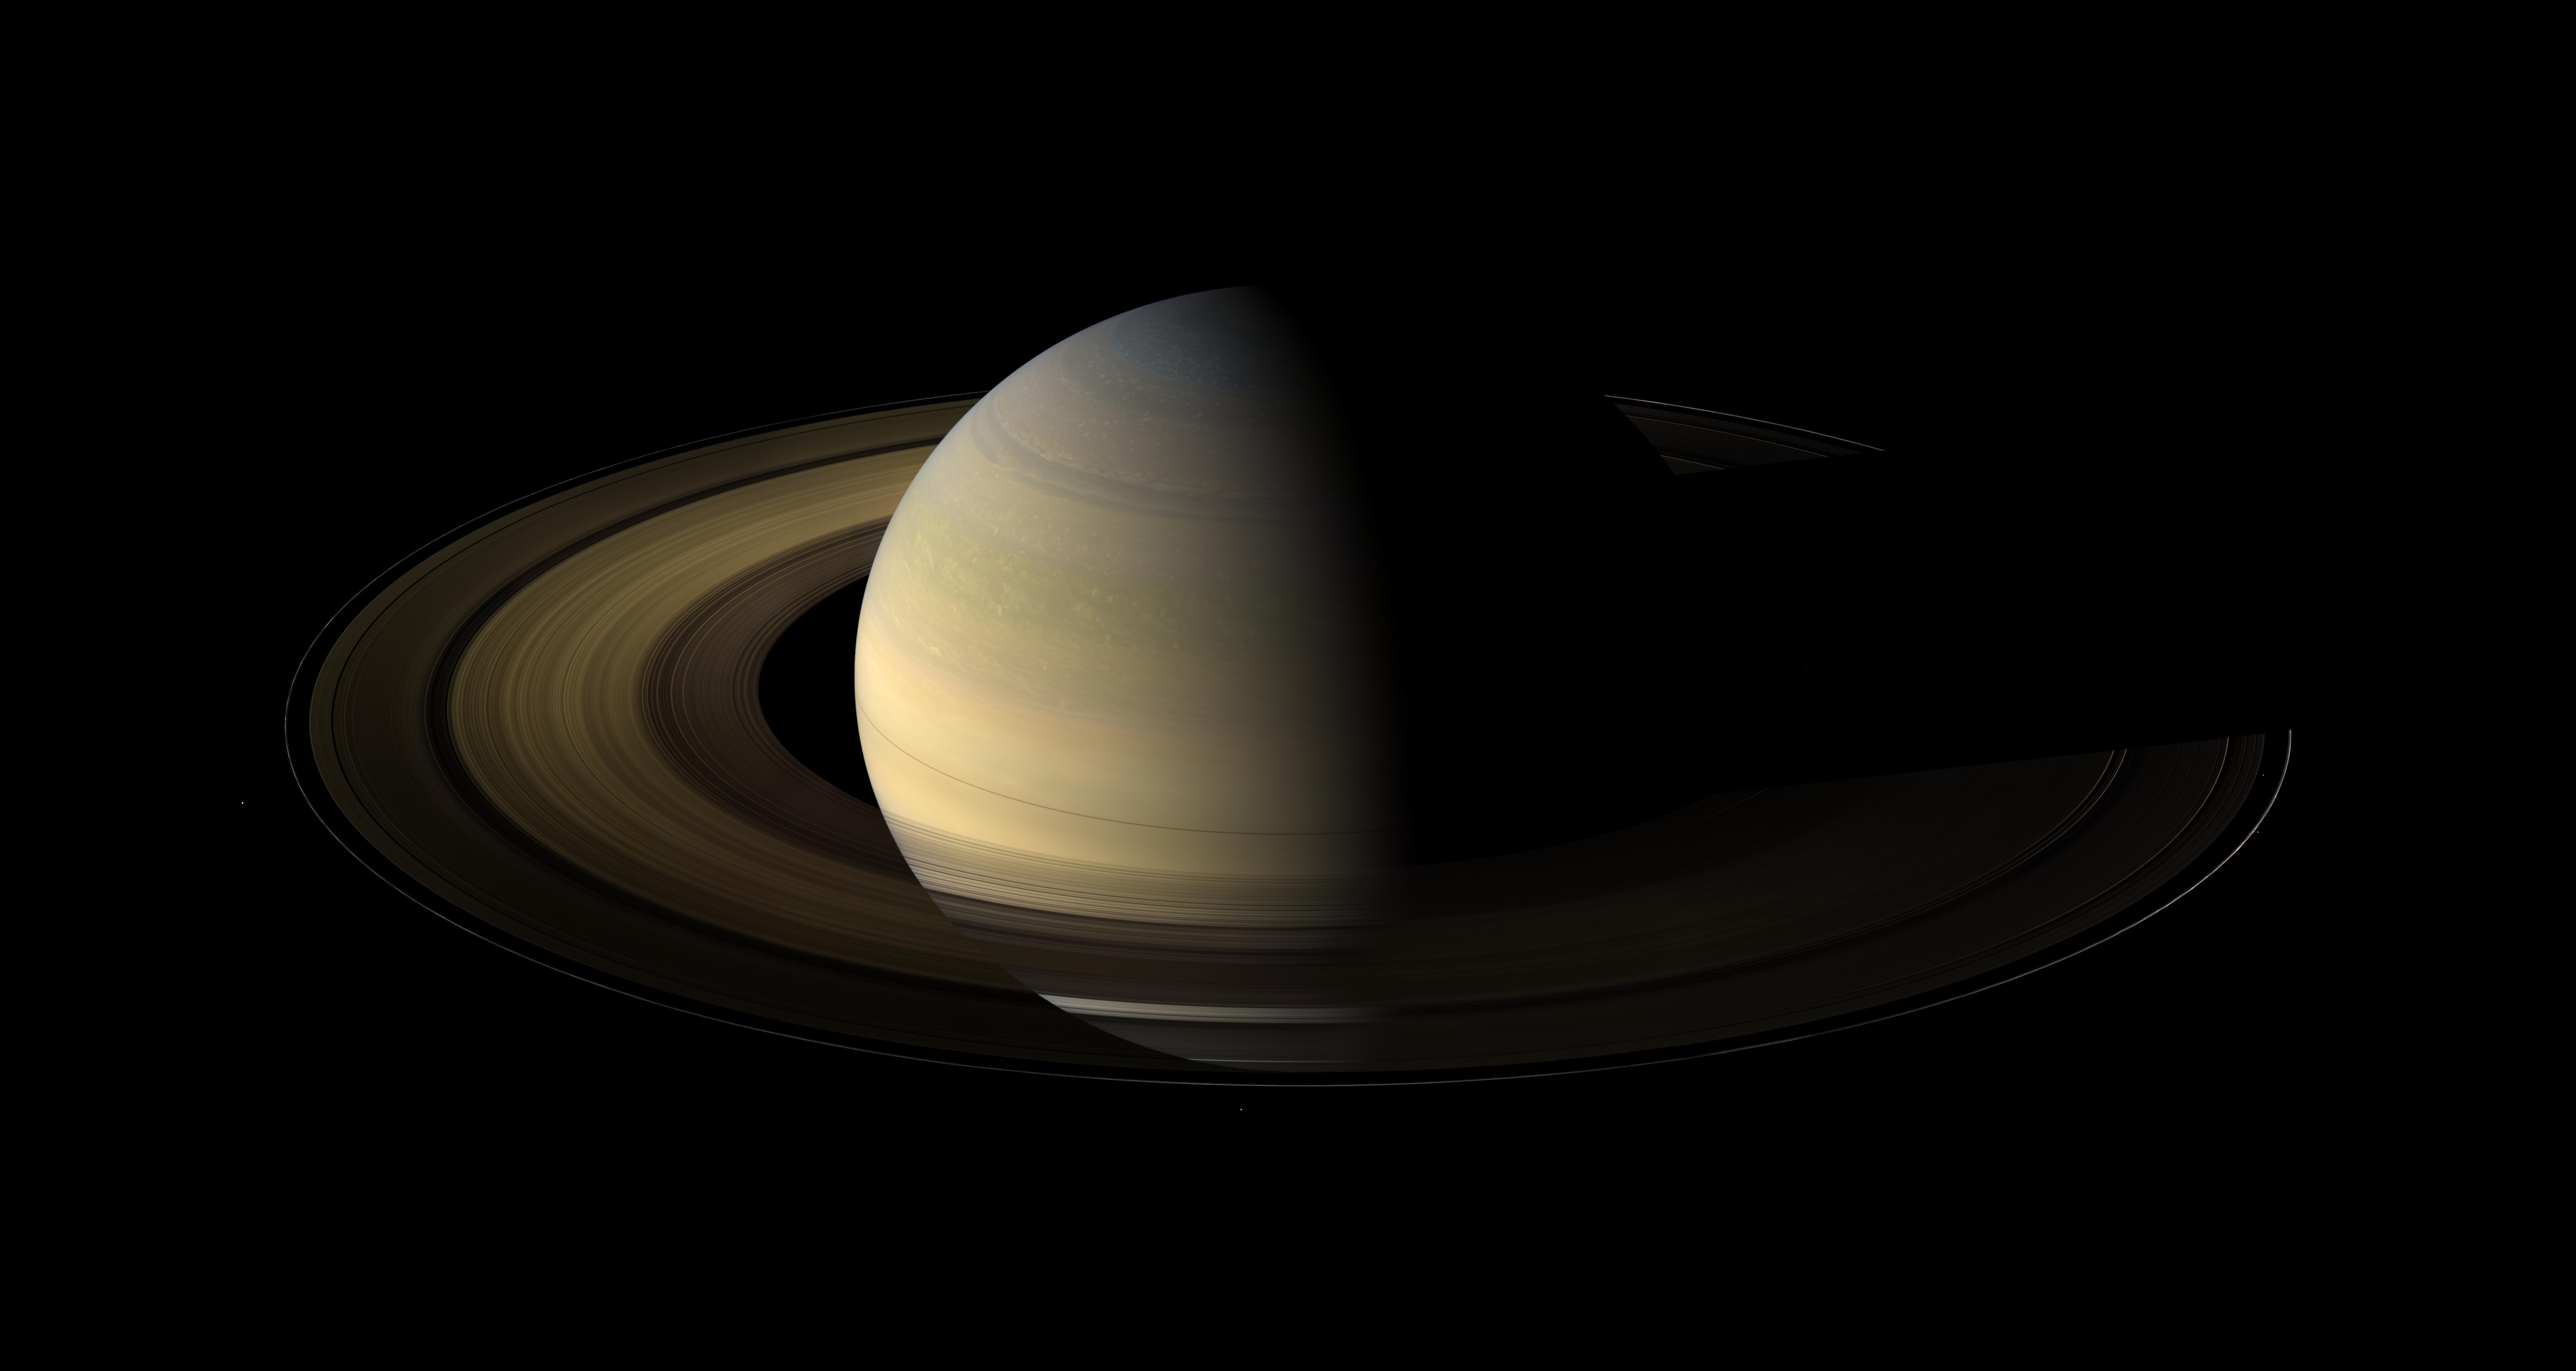 Saturne à l\'équinoxe